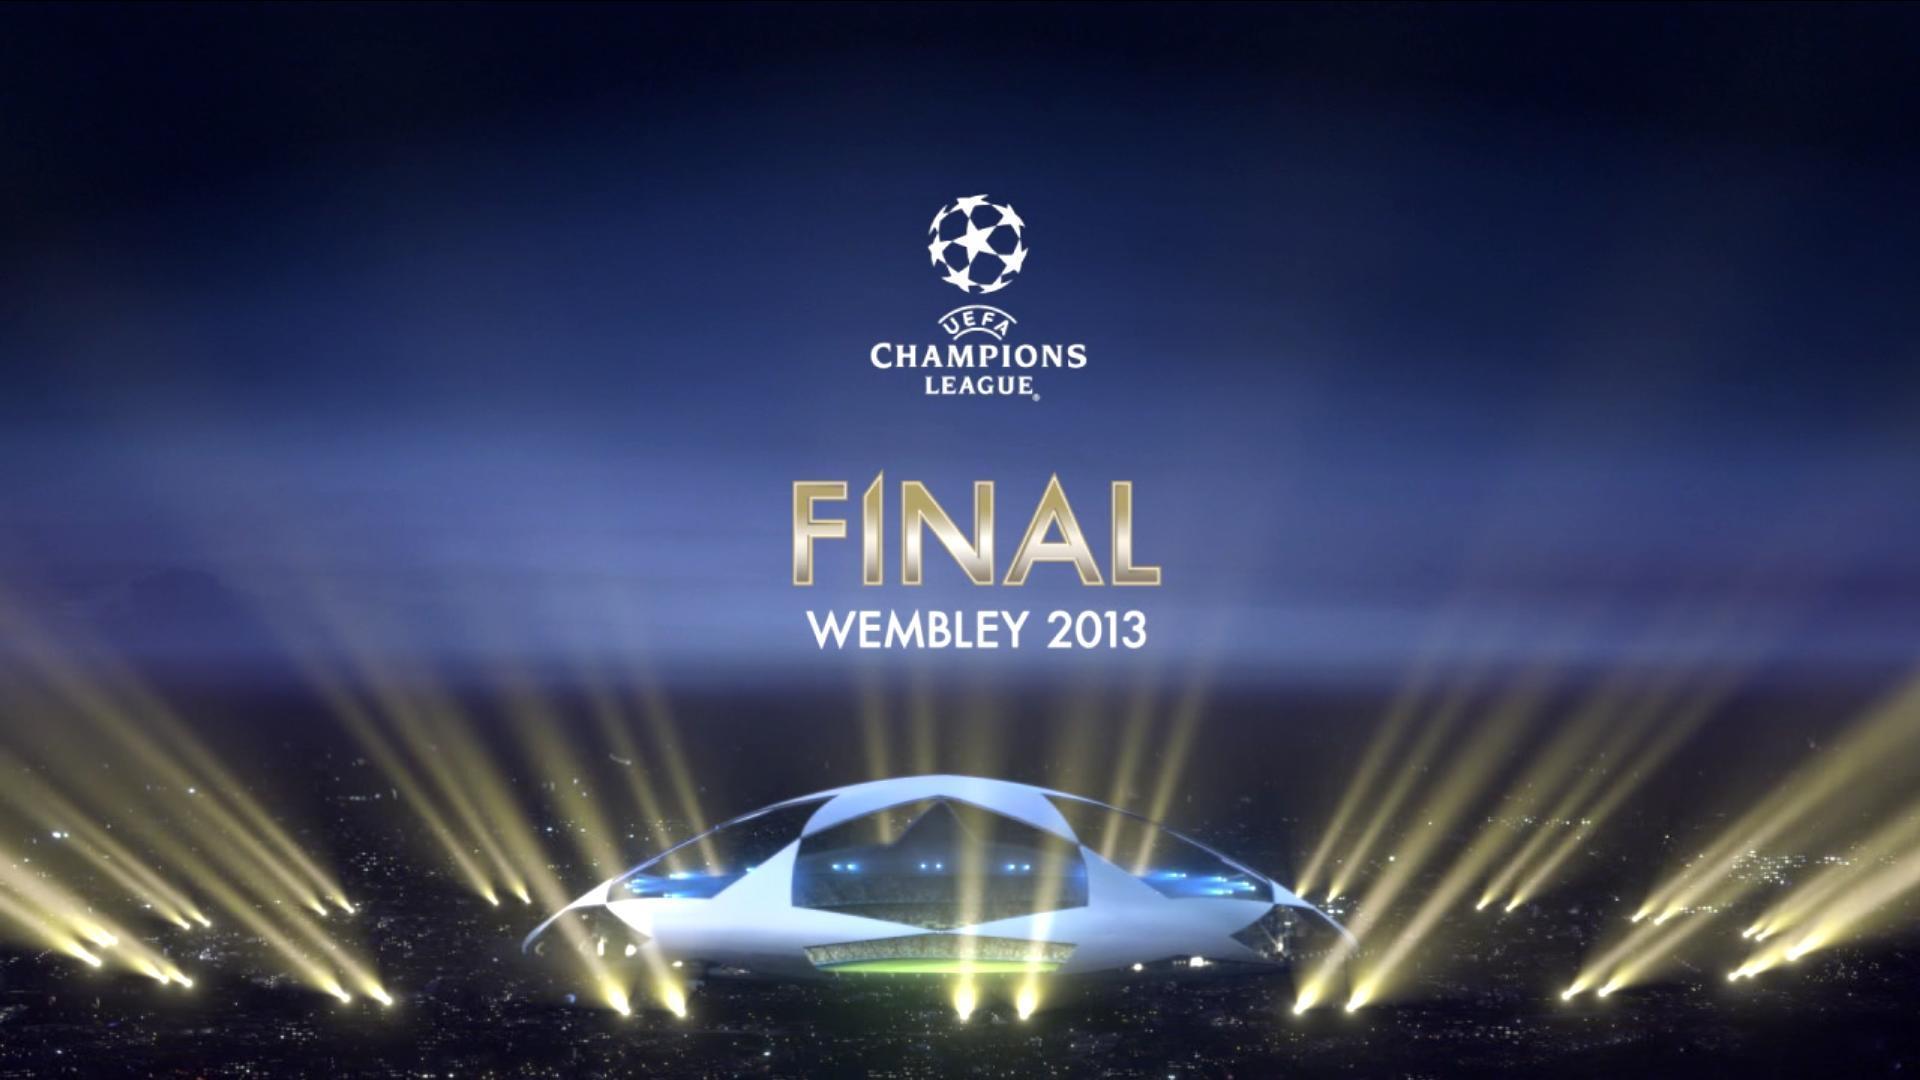 UEFA Champions League Wallpaper - Phone&Desktop Background Wallpaper